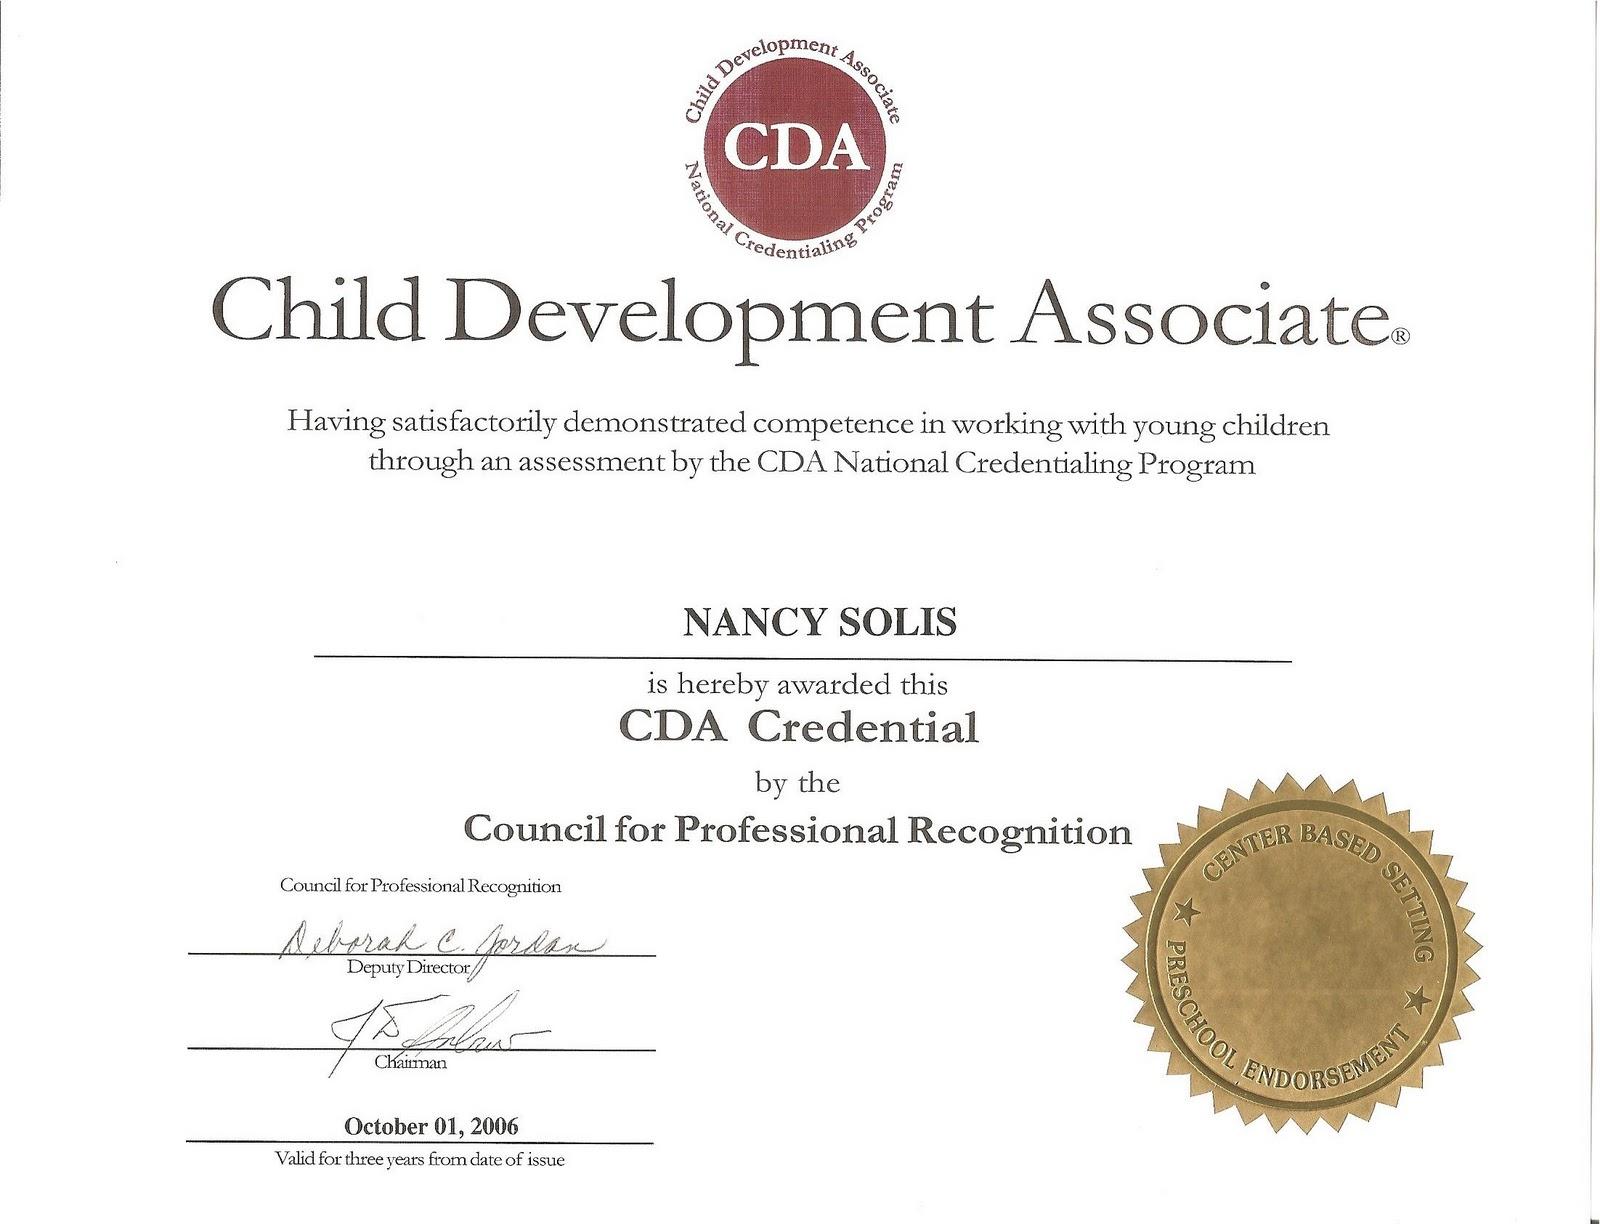 Nancy Solis Certifications